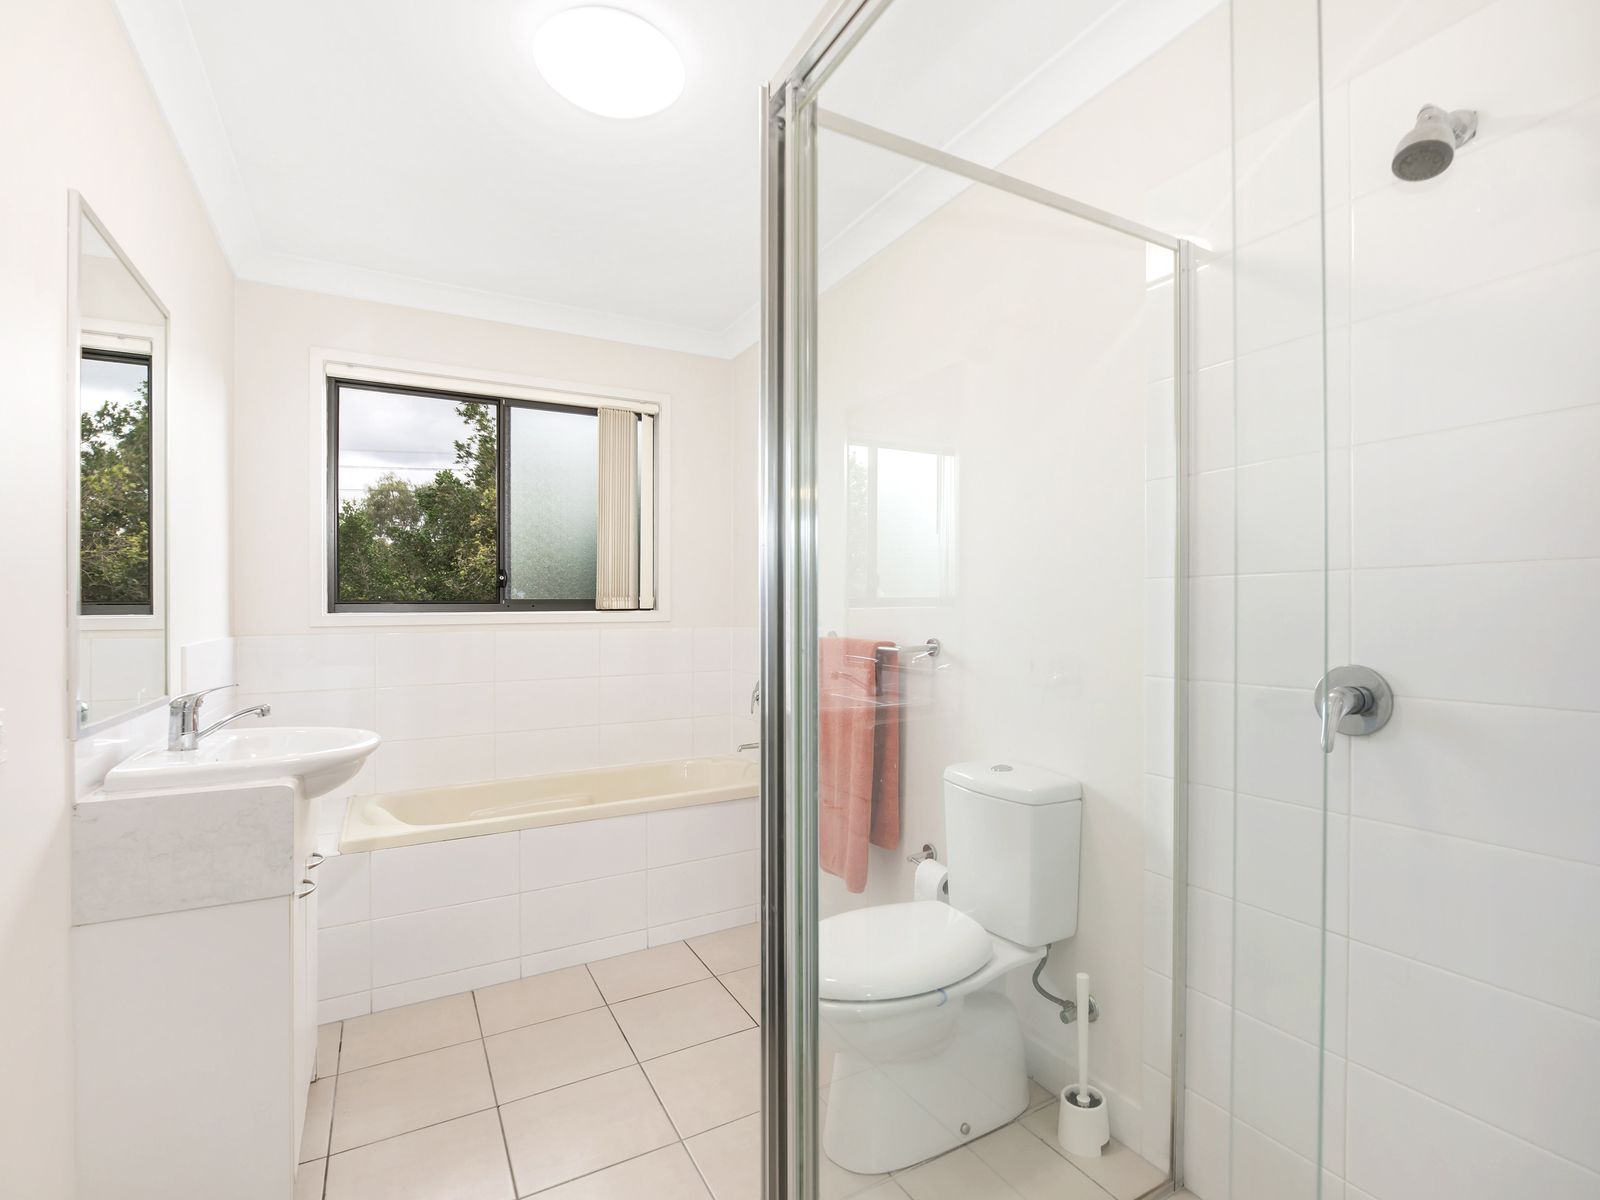 12/40-56 Gledson Street, North Booval, QLD 4304